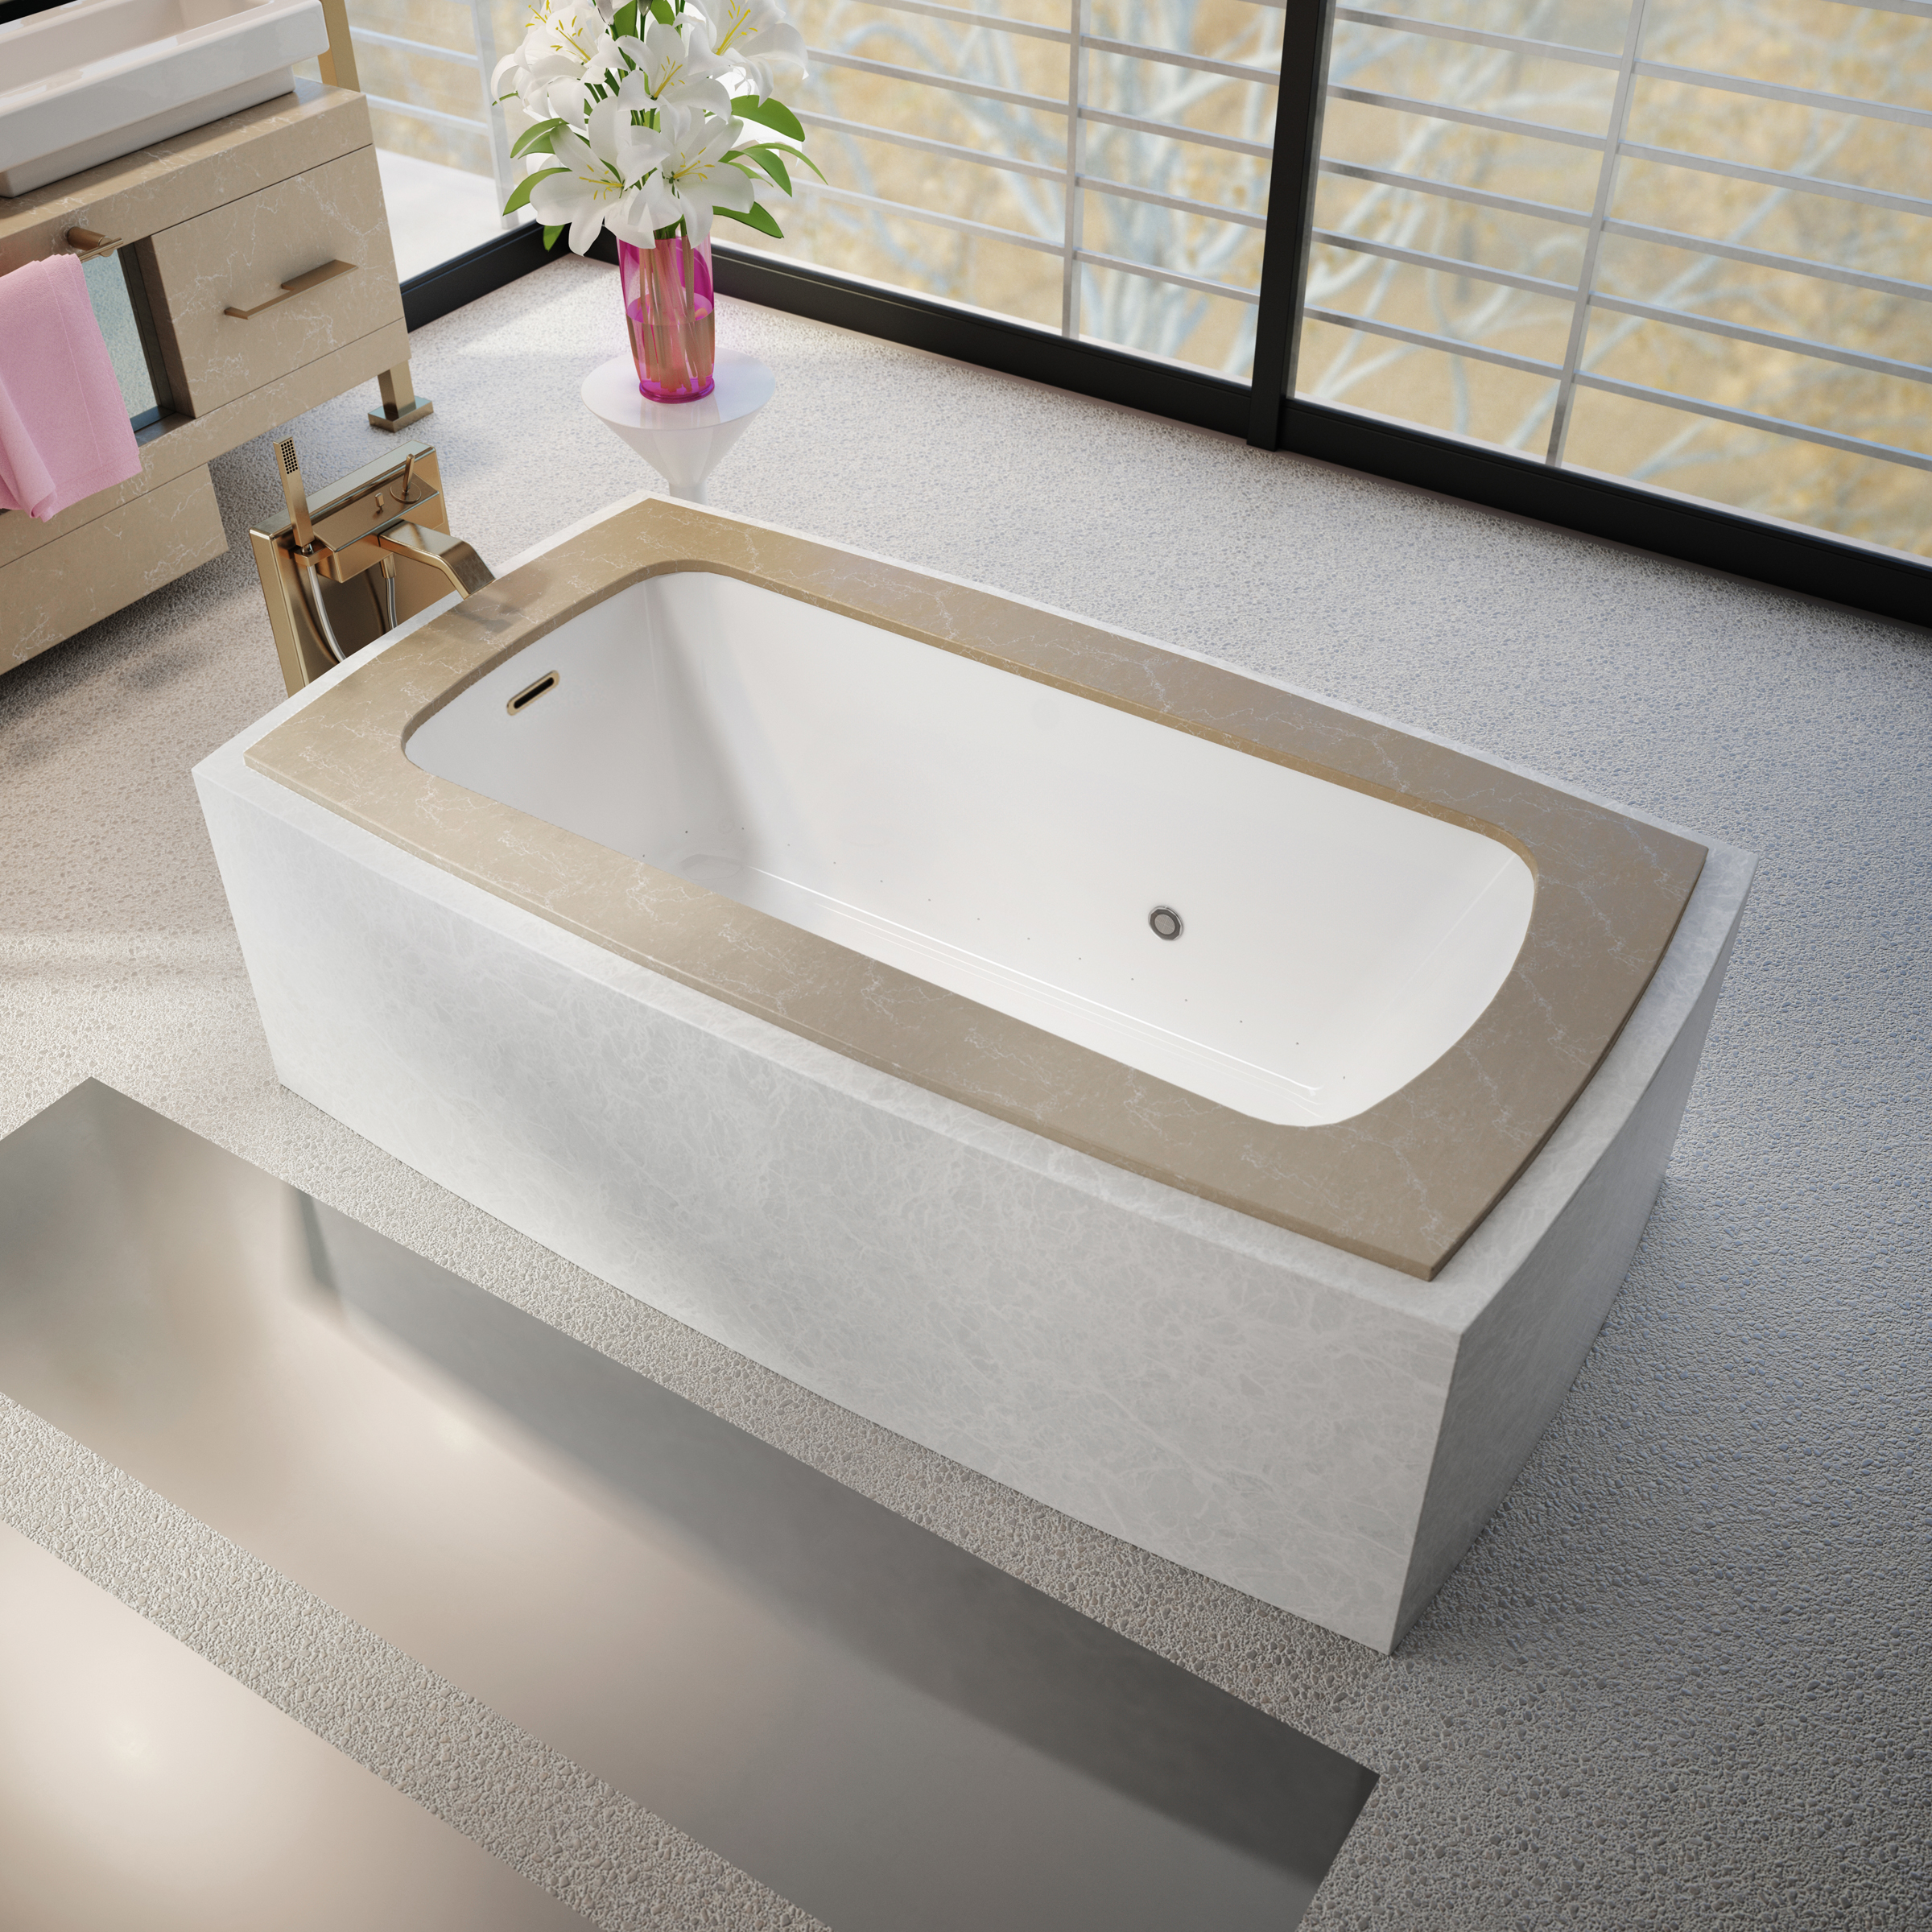 Bain Ultra Balneo Sanos Flat Deck Therapeutic Baths